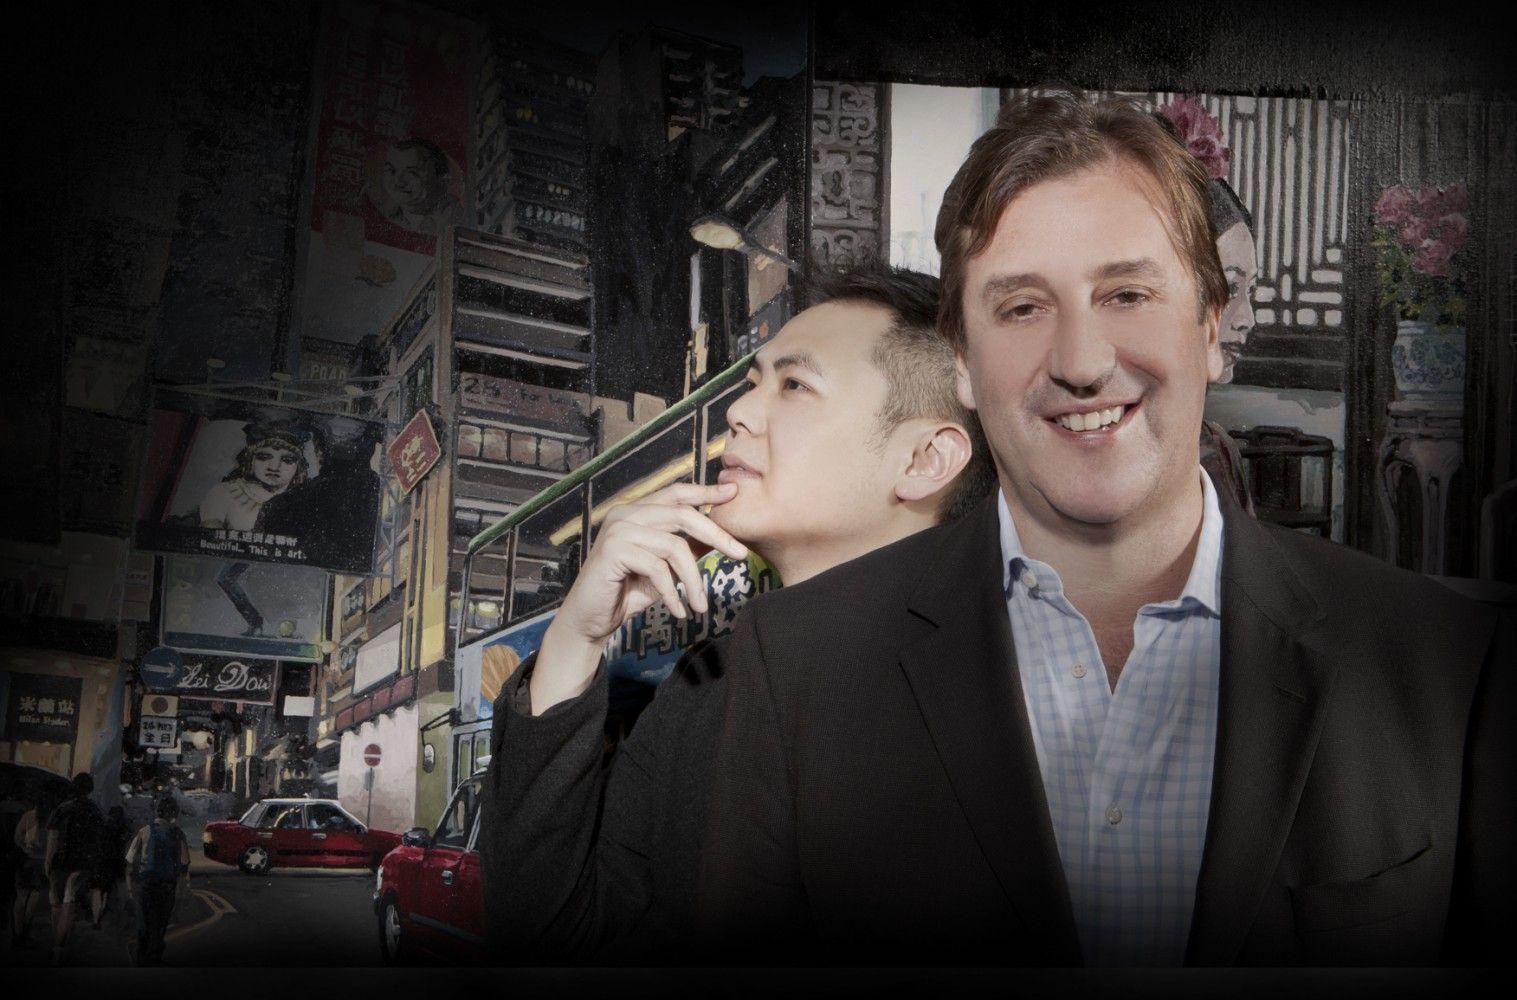 Howard Bilton & Chow Chun-fai